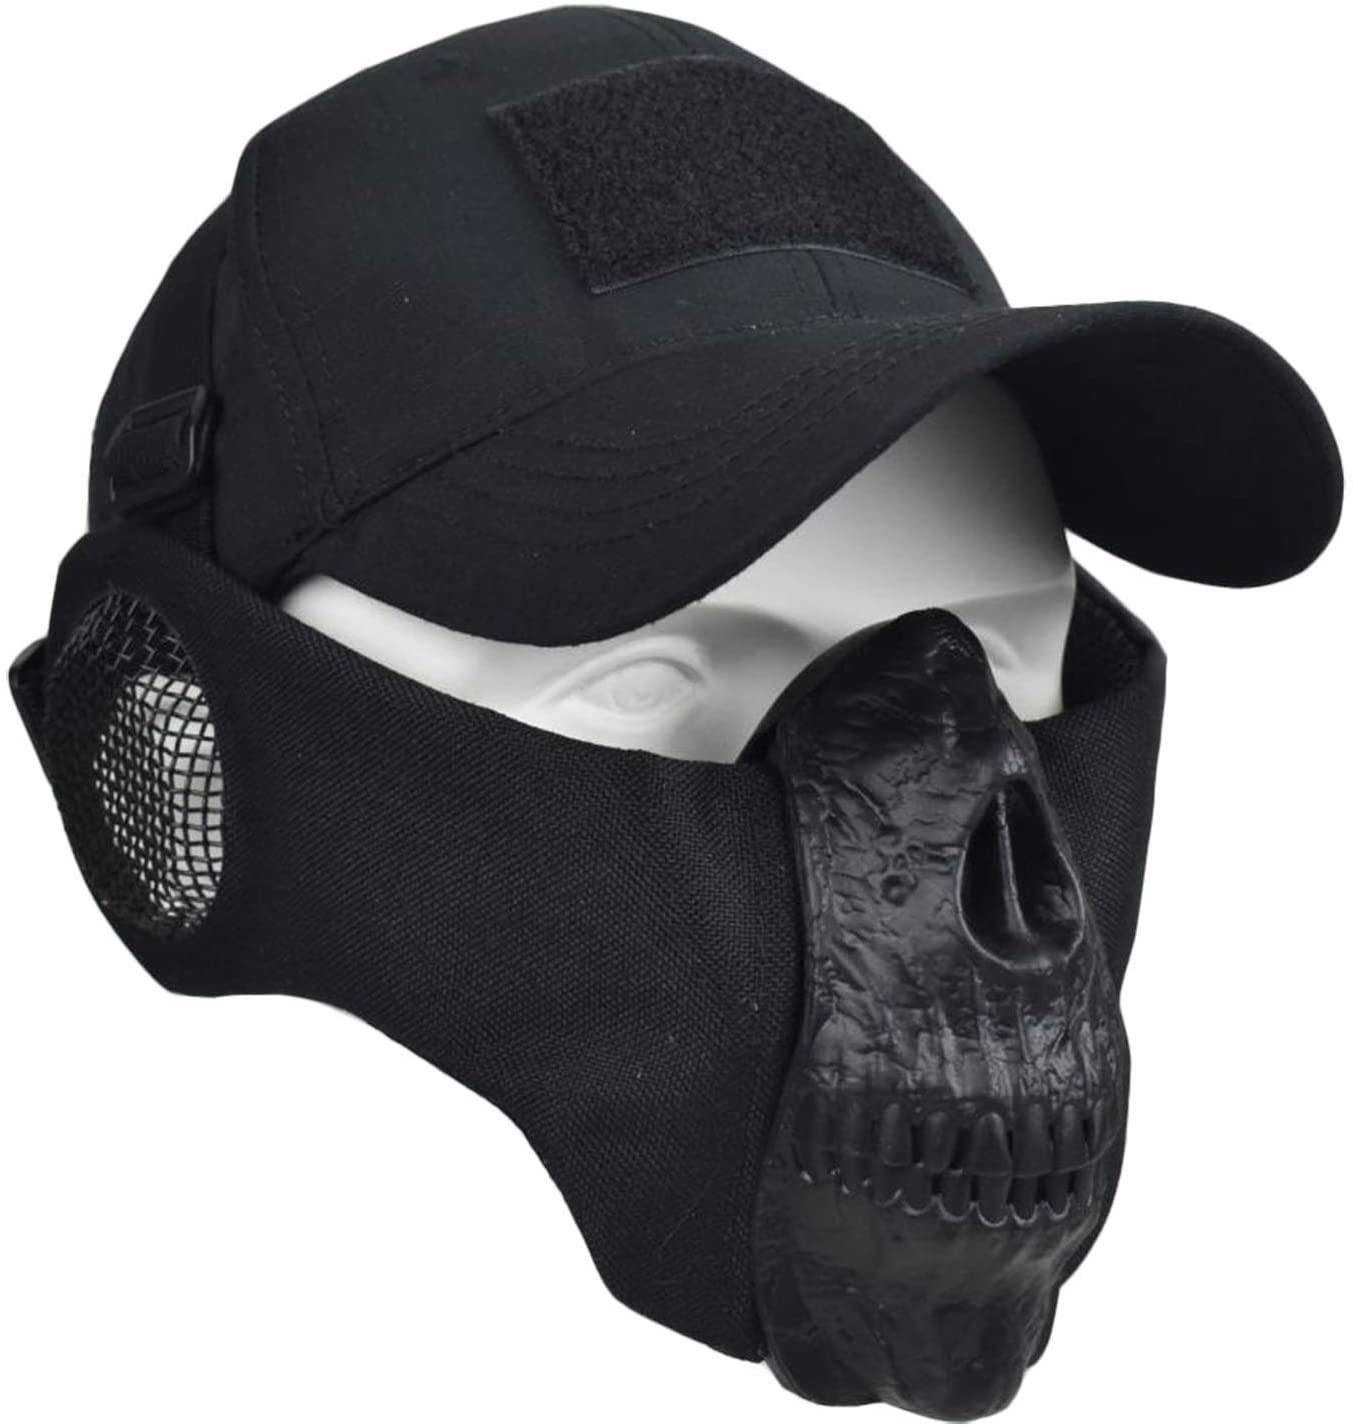 Jadedragon Airsoft Masks -Half Face Skull Mask with Ear Protection and Adjustable Baseball Cap Set for Airsoft/Paintball/BB Gun/CS Game/Hunting/Shooting